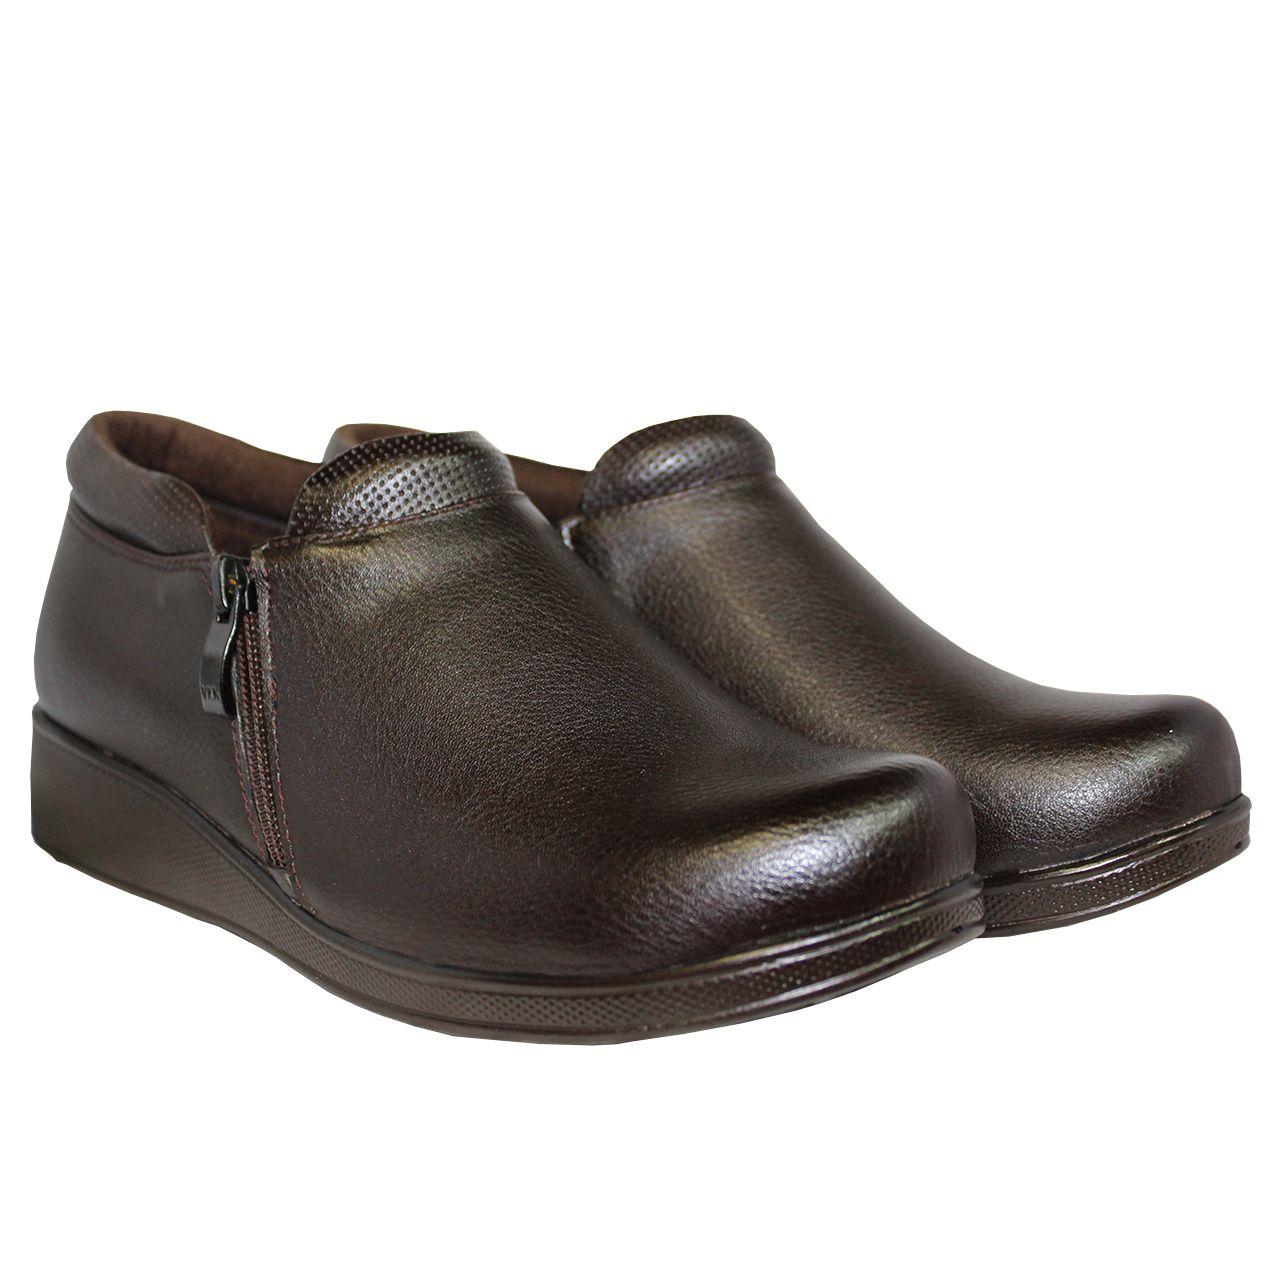 کفش روزمره زنانه لیانا کد 362-GH -  - 2